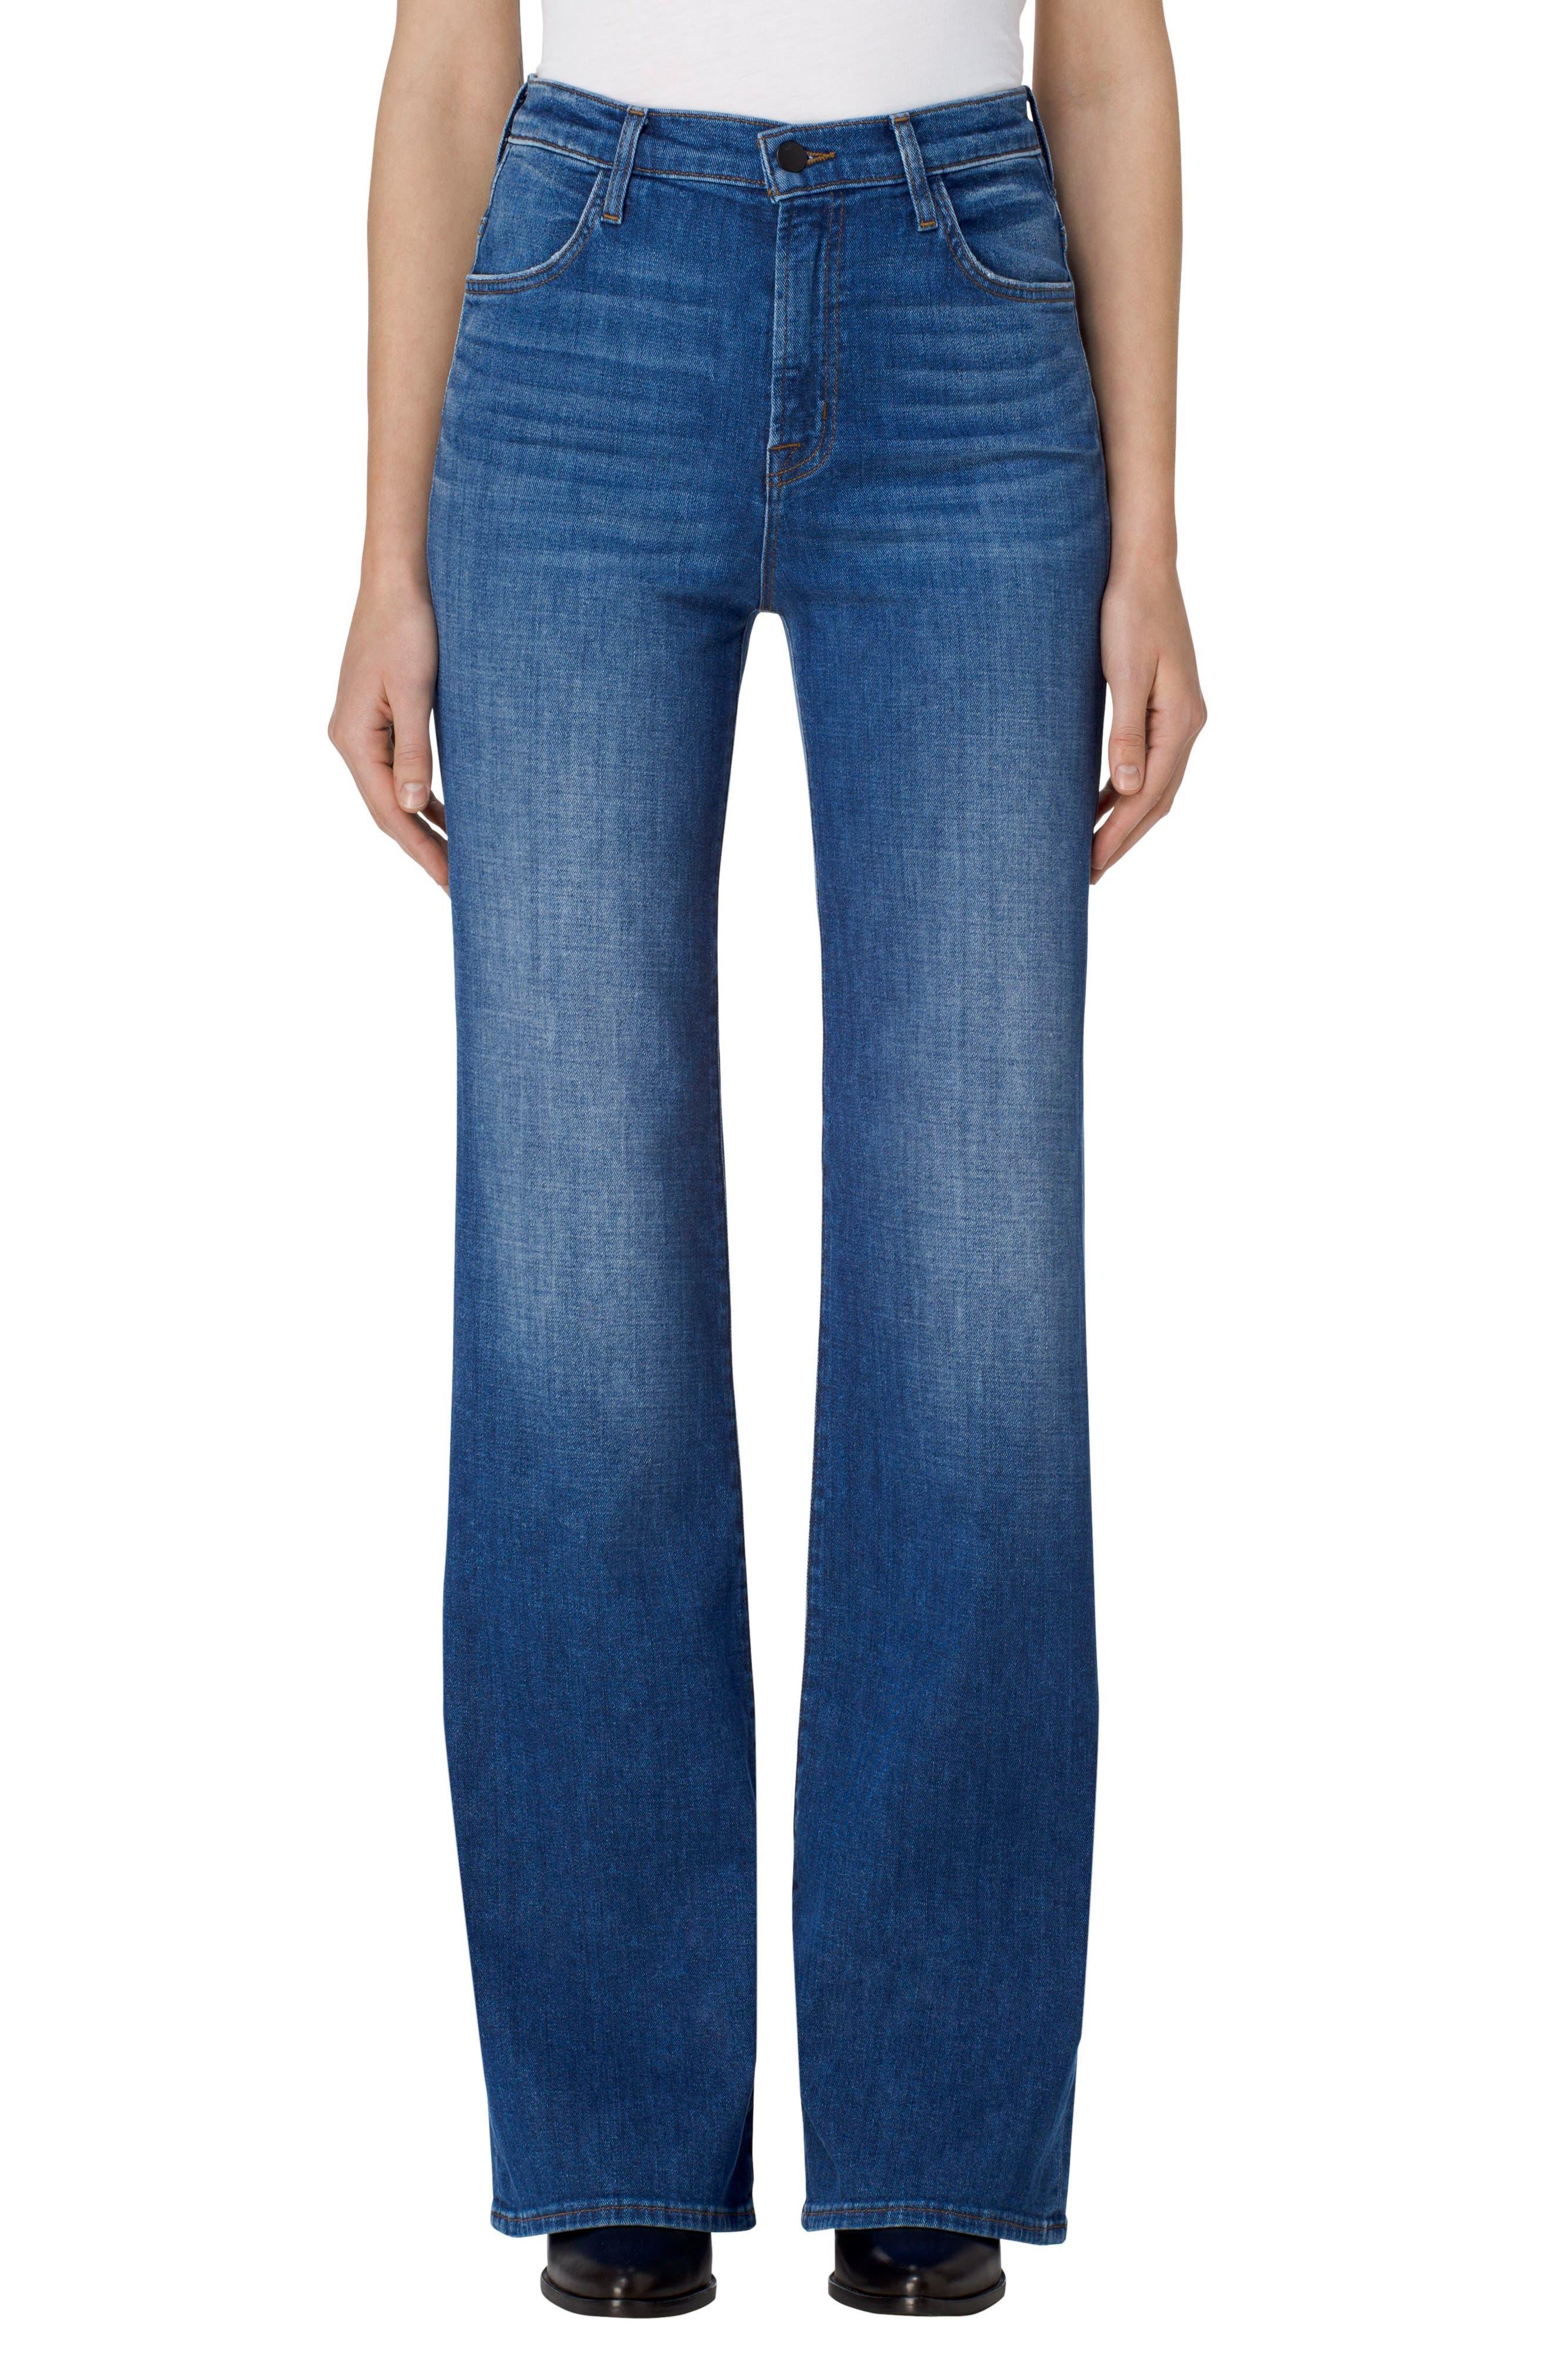 J Brand Joan High Waist Wide Leg Jeans